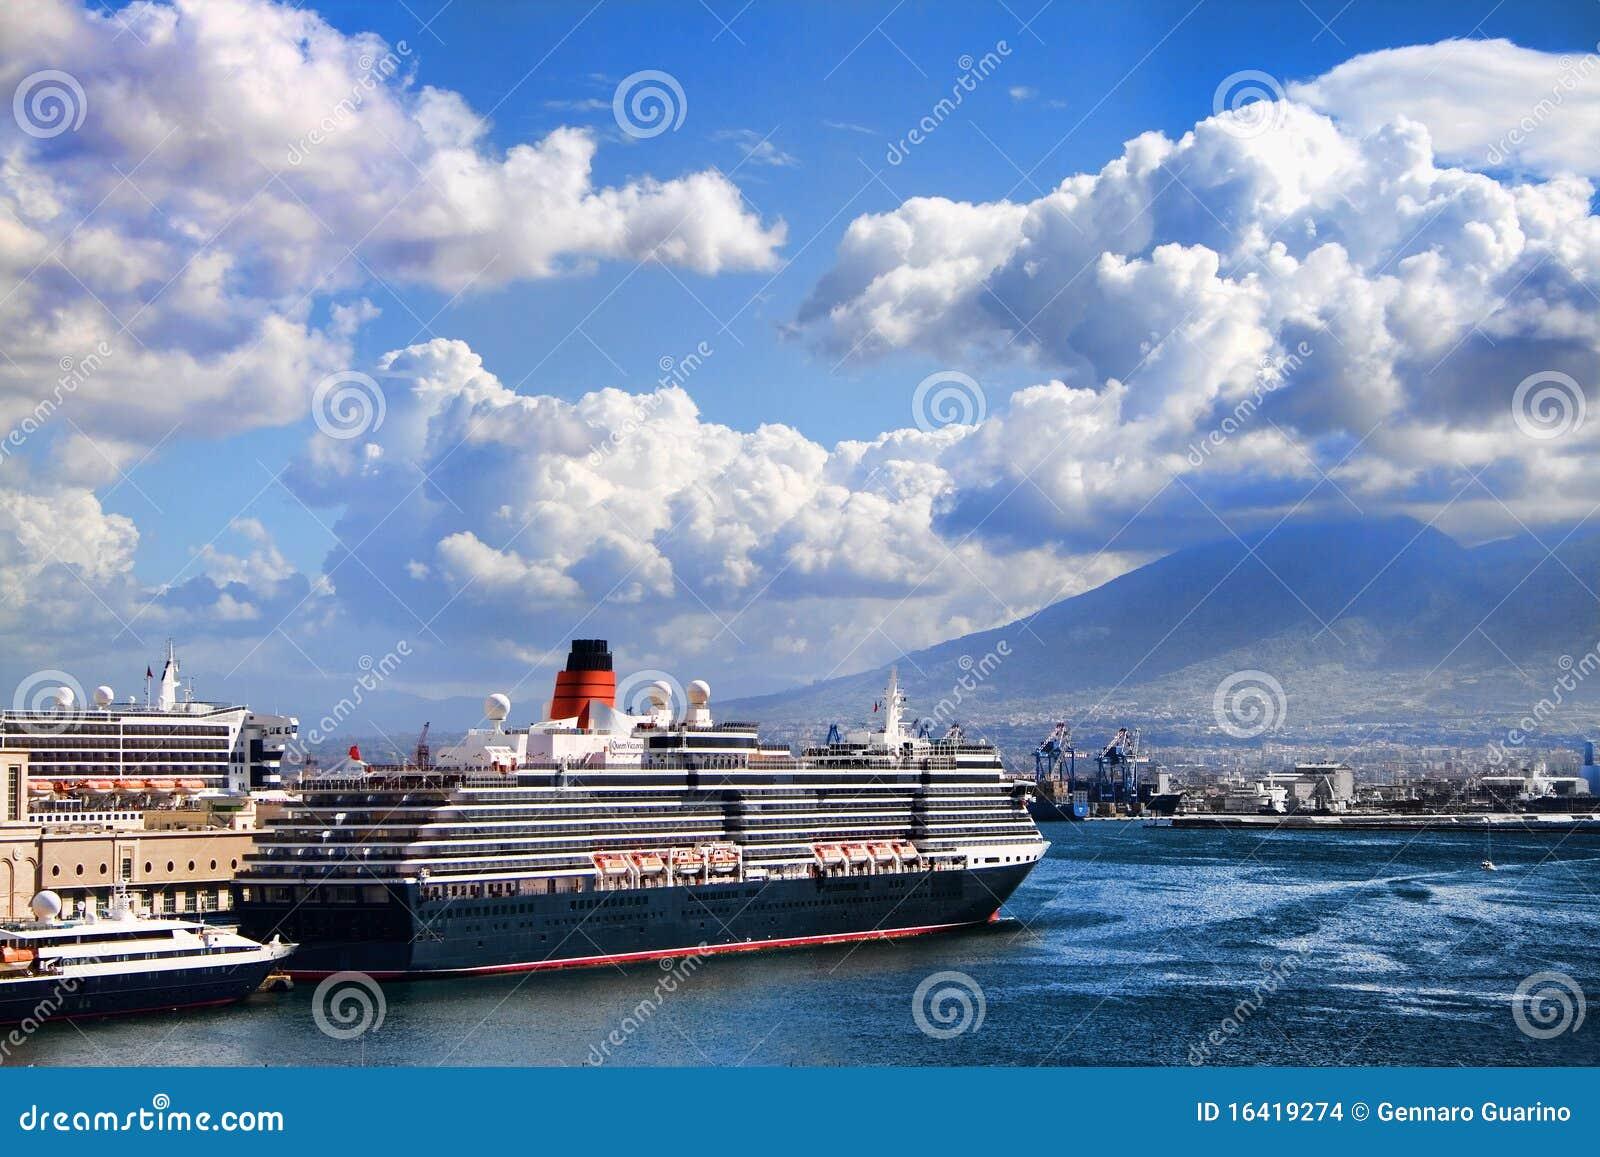 Neapel-Boot im Hafen